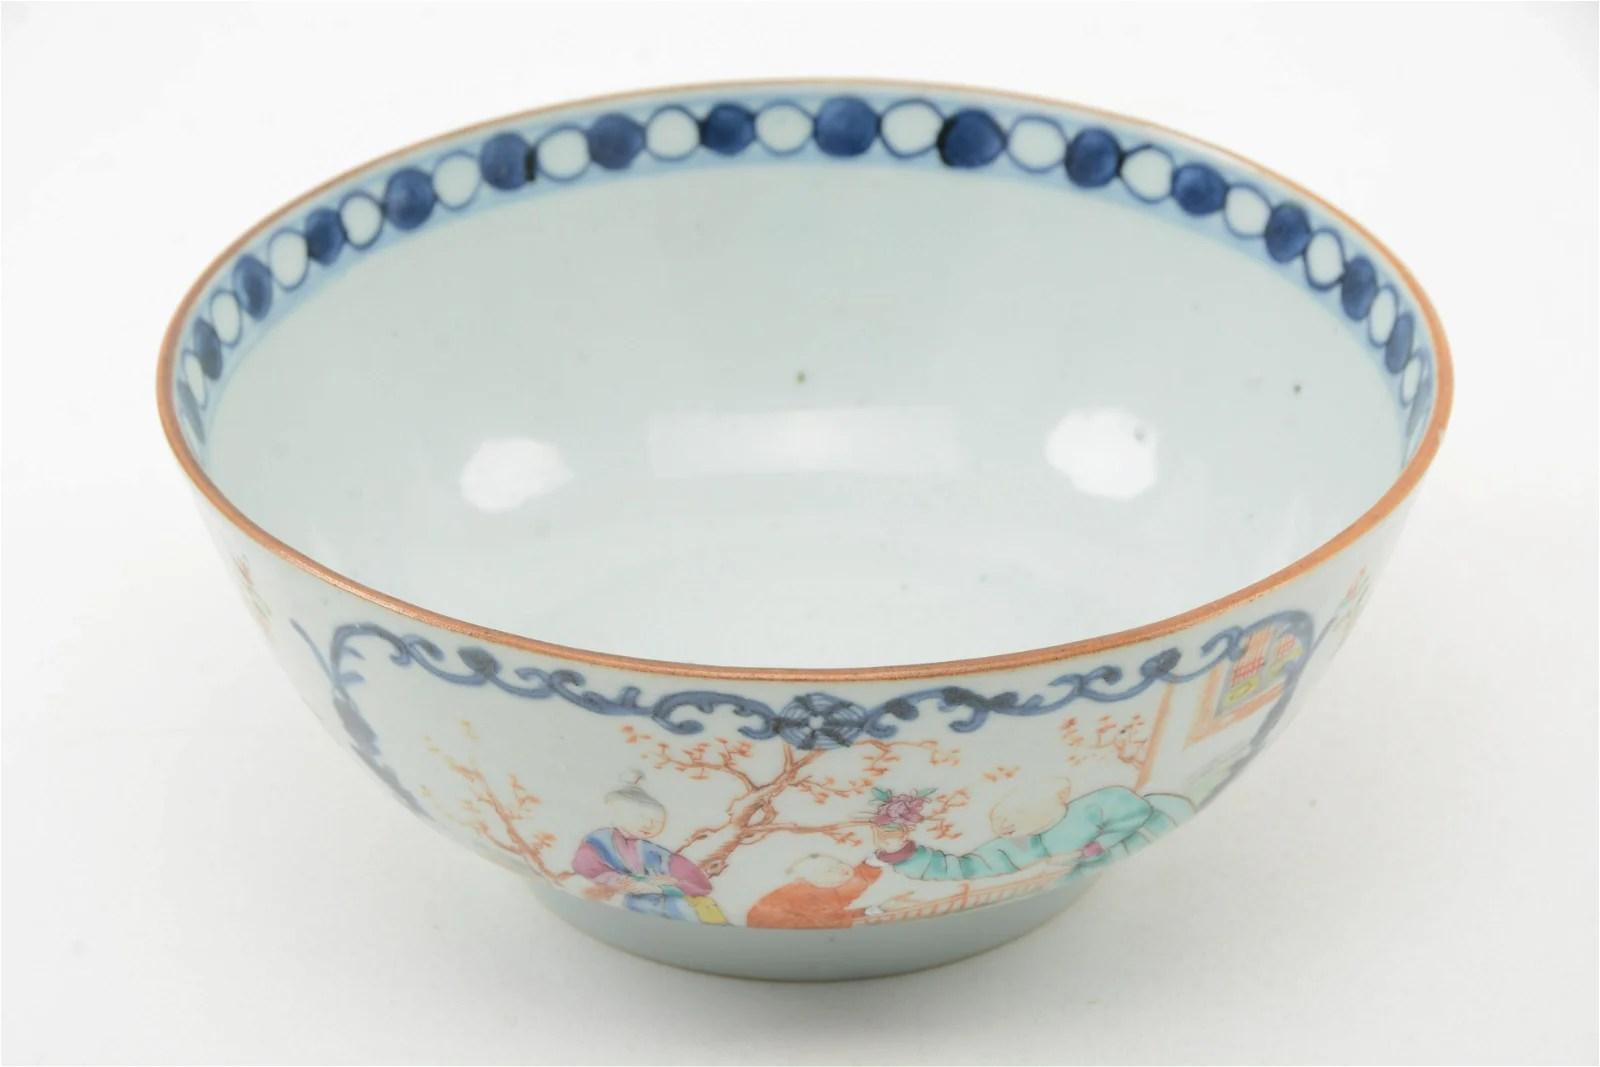 Chinese Export Mandarin Decorated Bowl